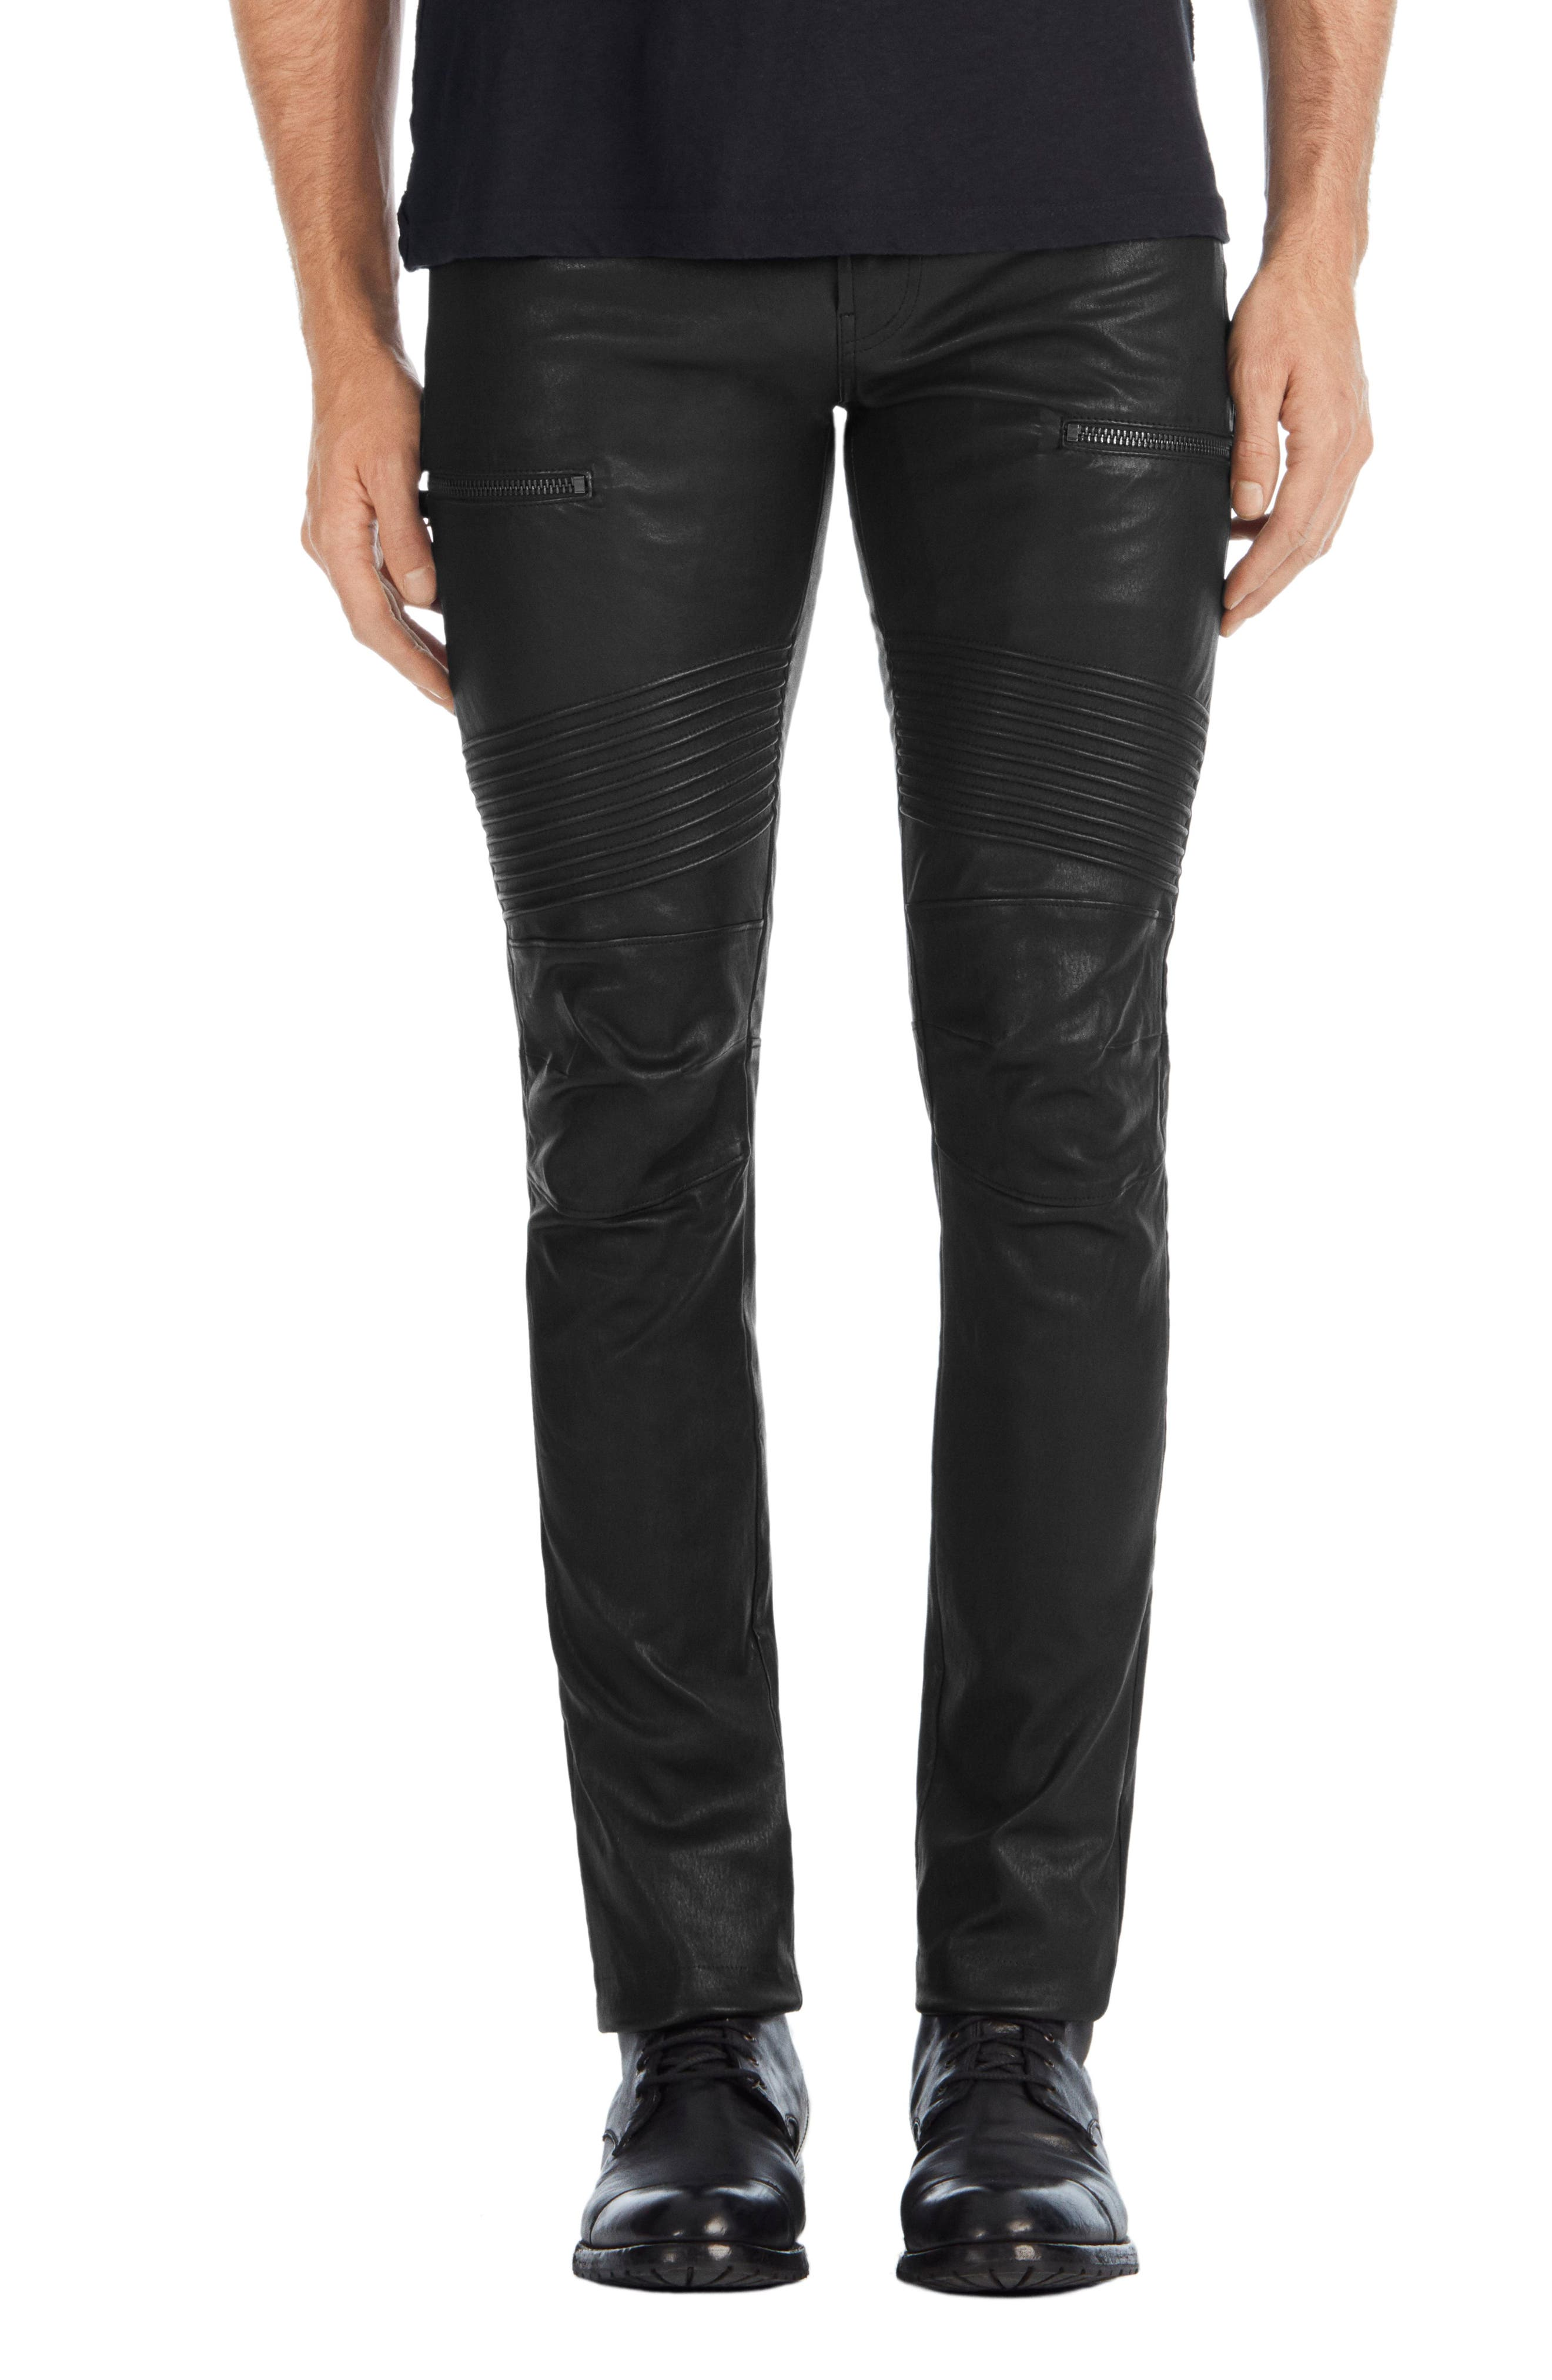 Acrux Skinny Leg Leather Pants,                             Main thumbnail 1, color,